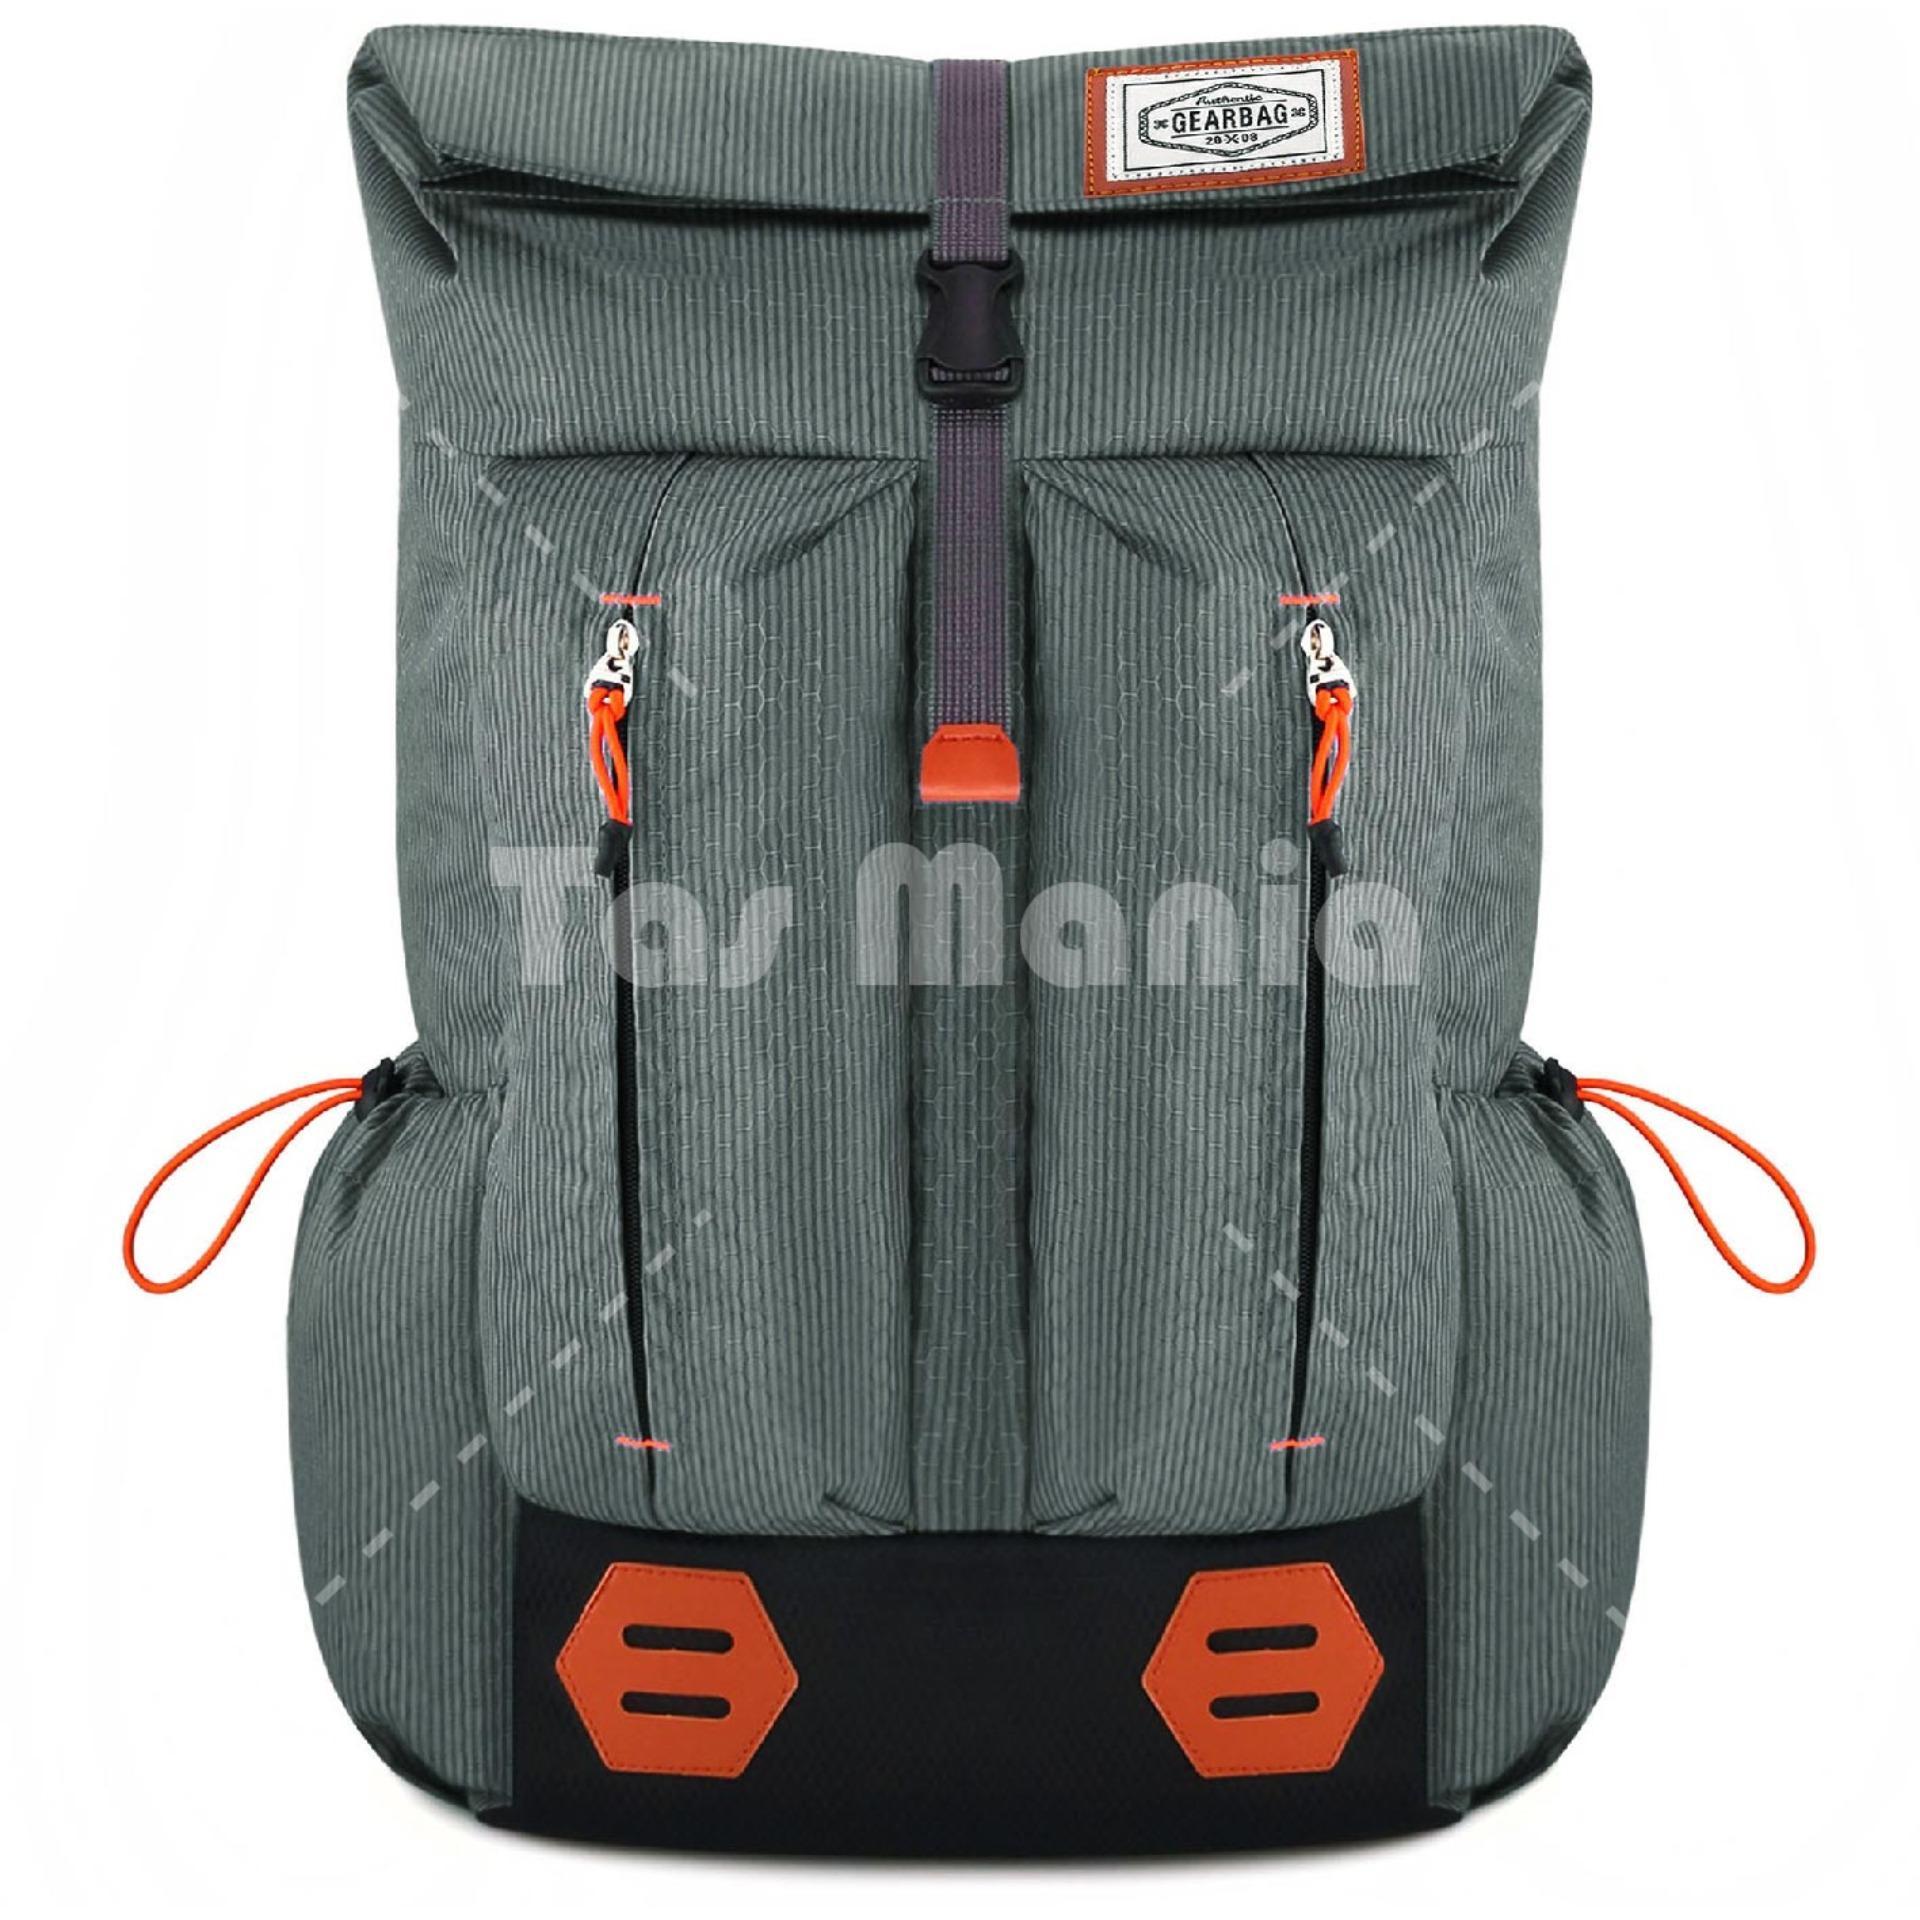 Gear Bag Excalibur Mountaineering Backpack Coffee Zv 01 Dan Source · Gambar Produk Tas Ransel Gear